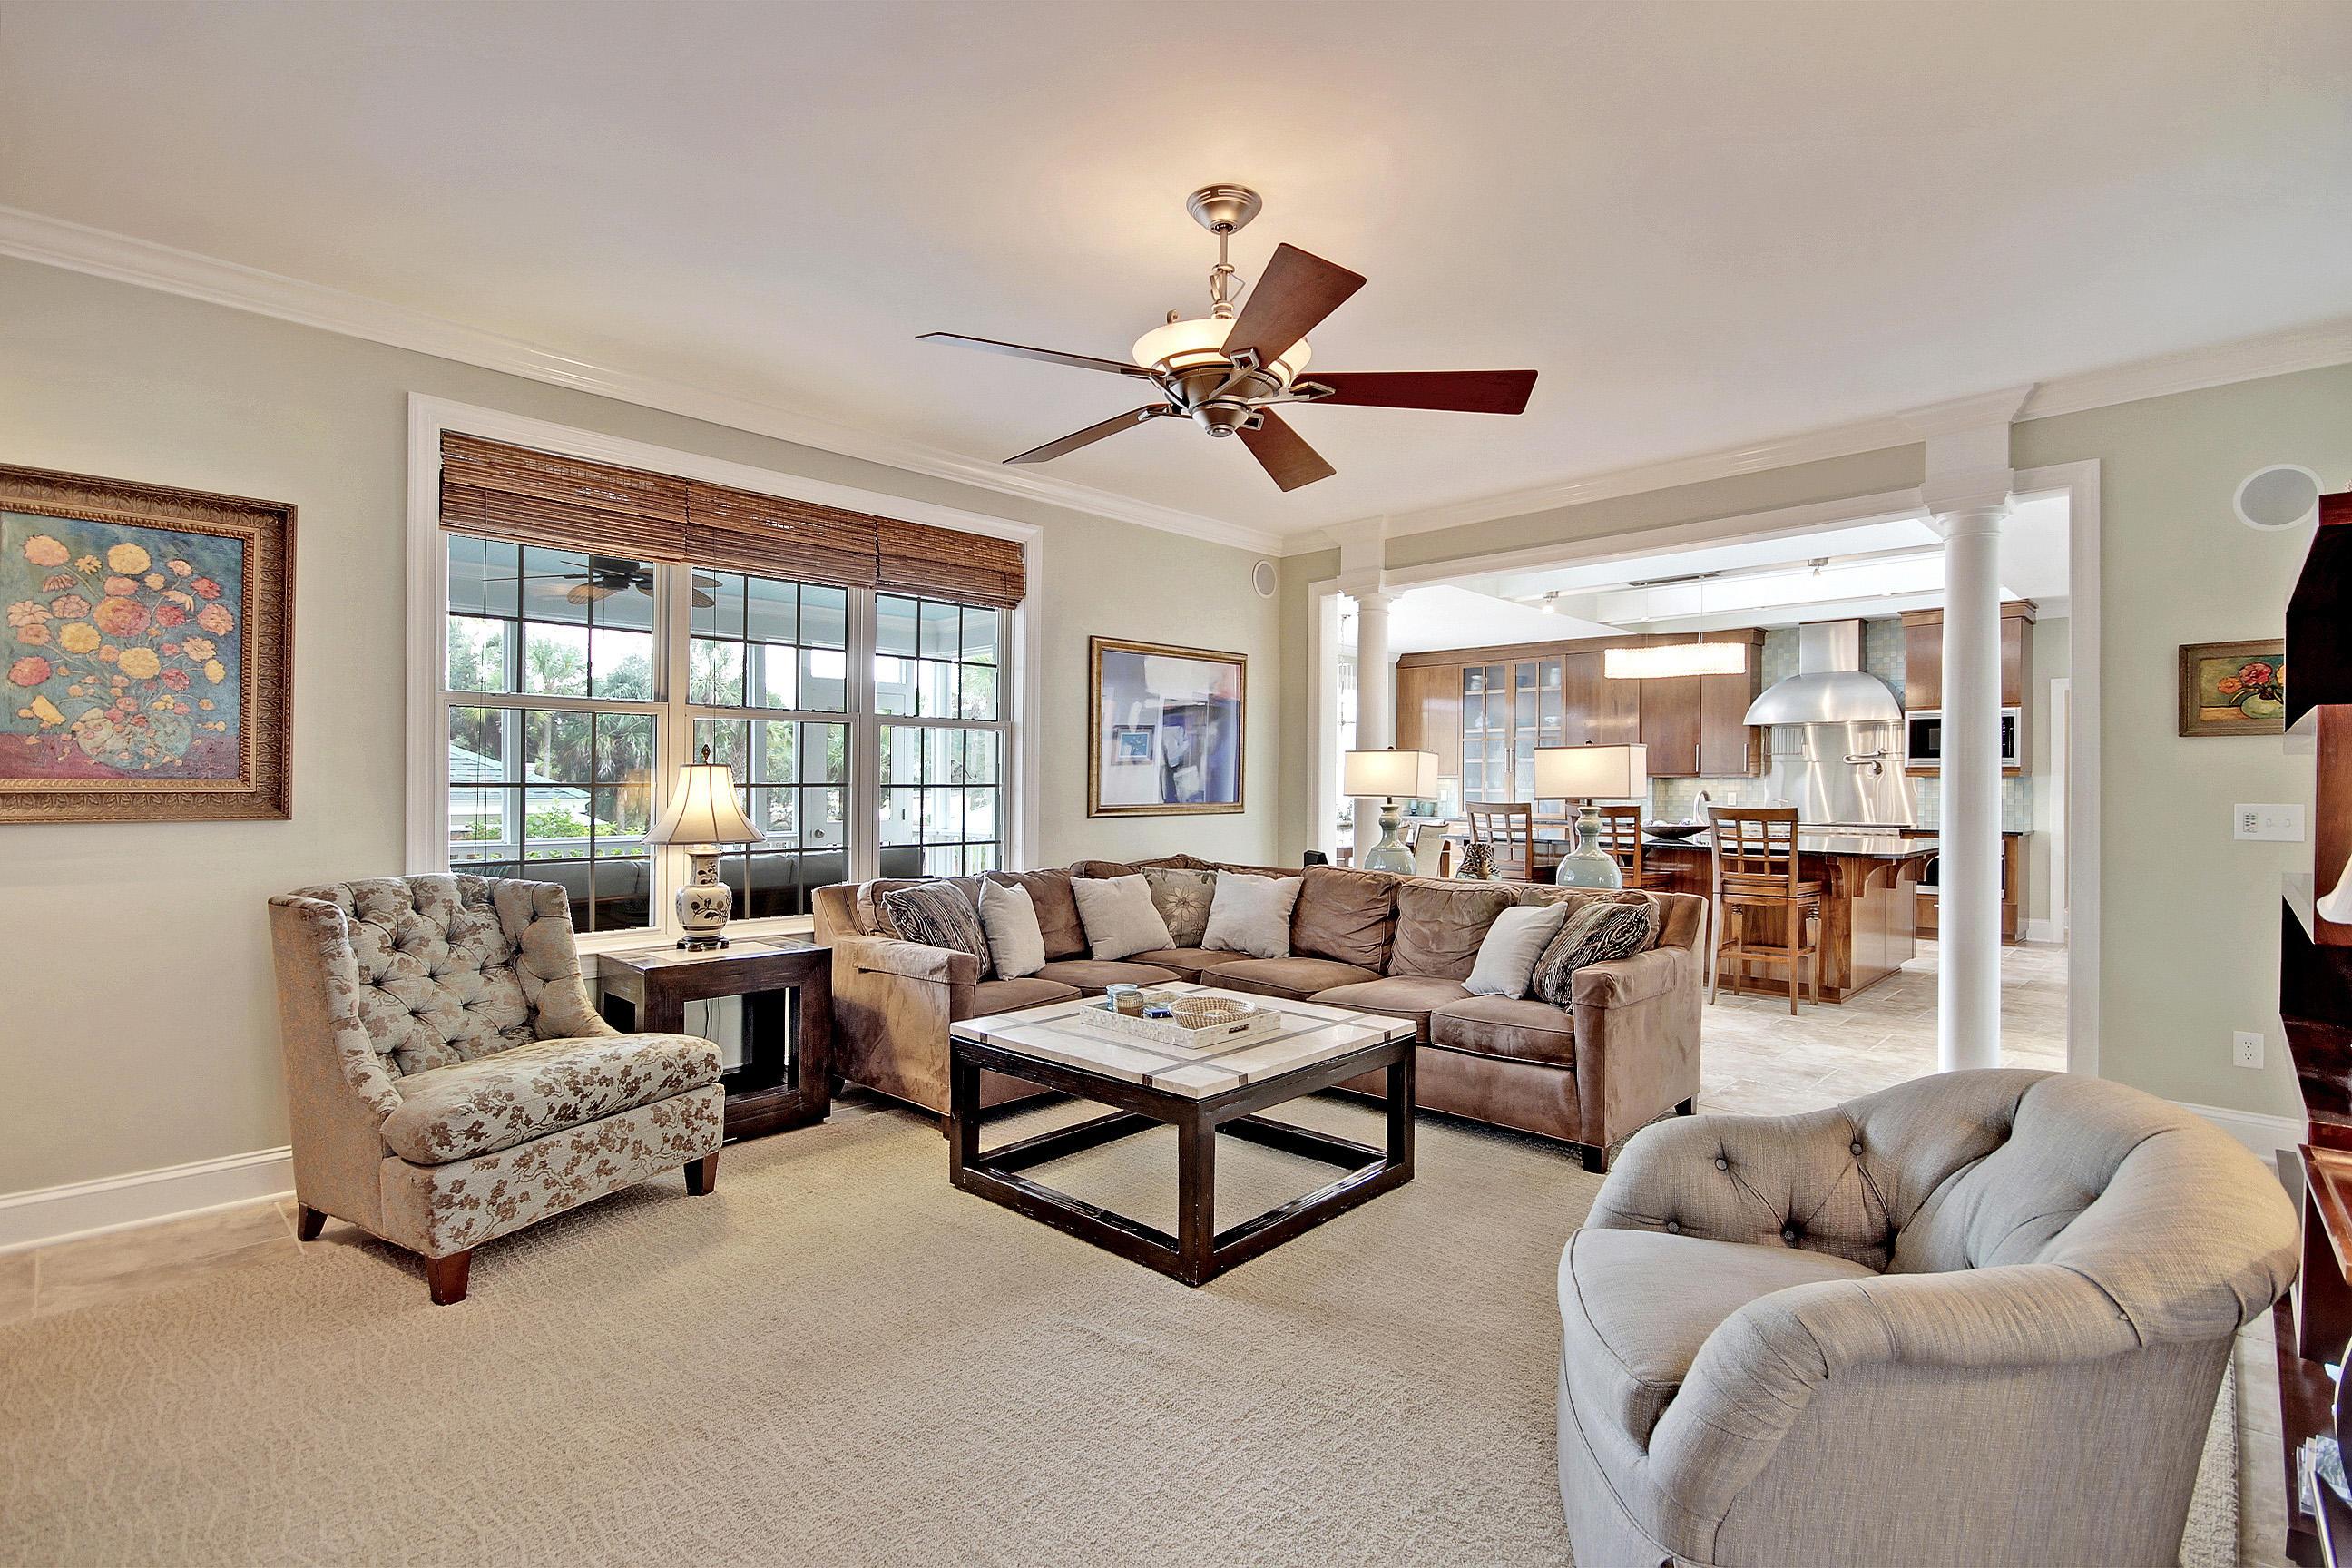 Dunes West Homes For Sale - 2364 Darts Cove, Mount Pleasant, SC - 52